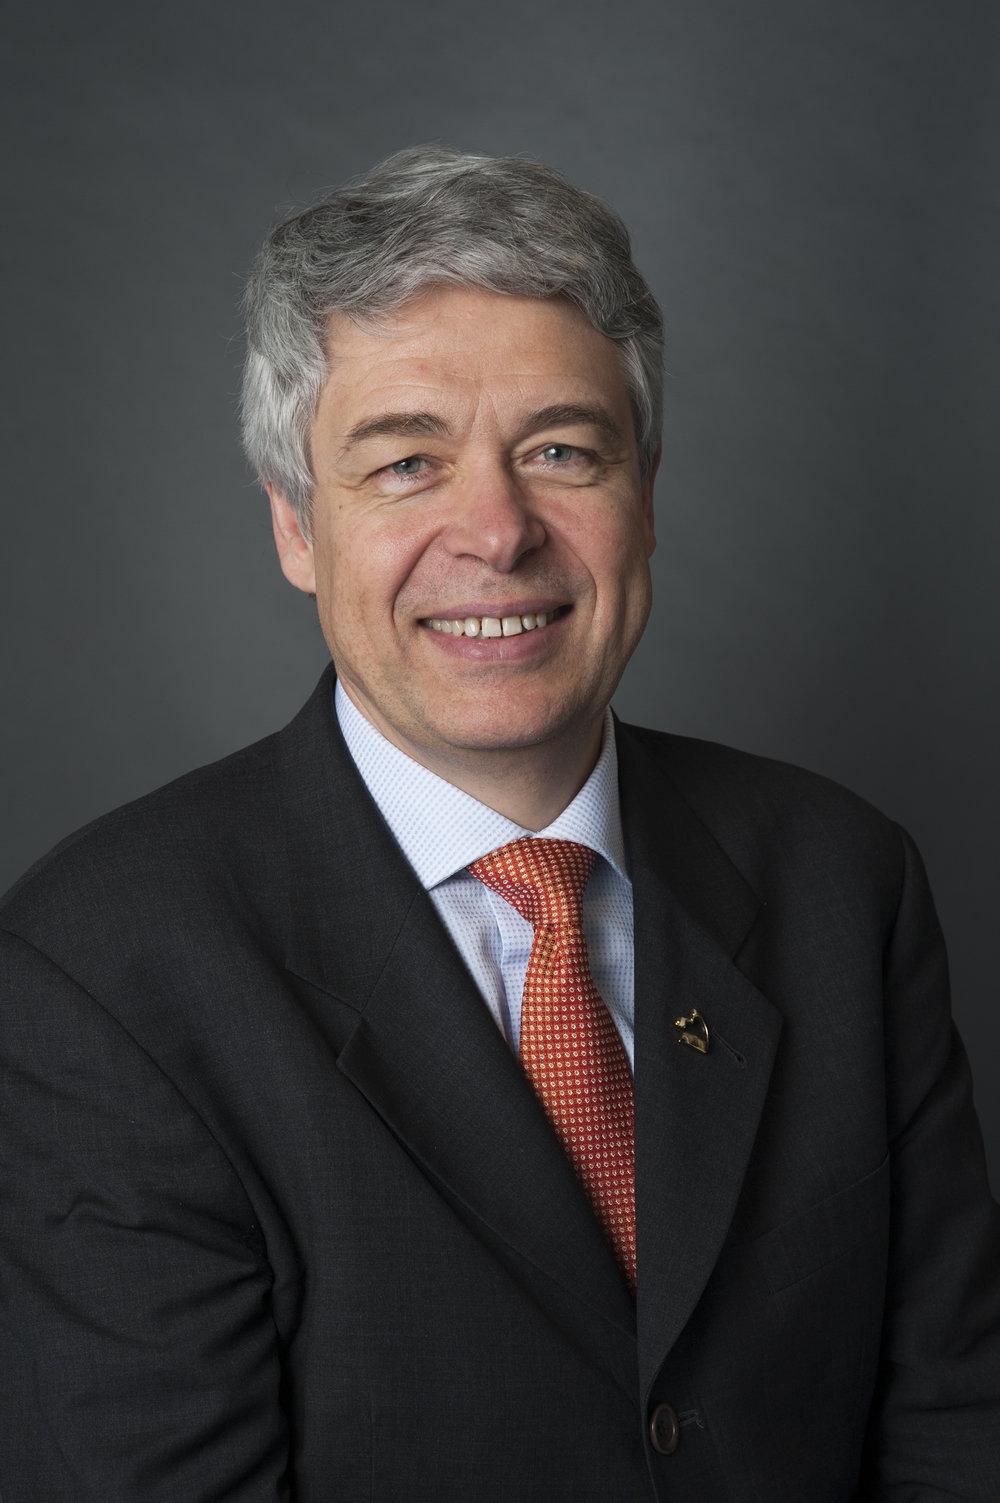 Alexandre Mebazaa (Paris, FRA)